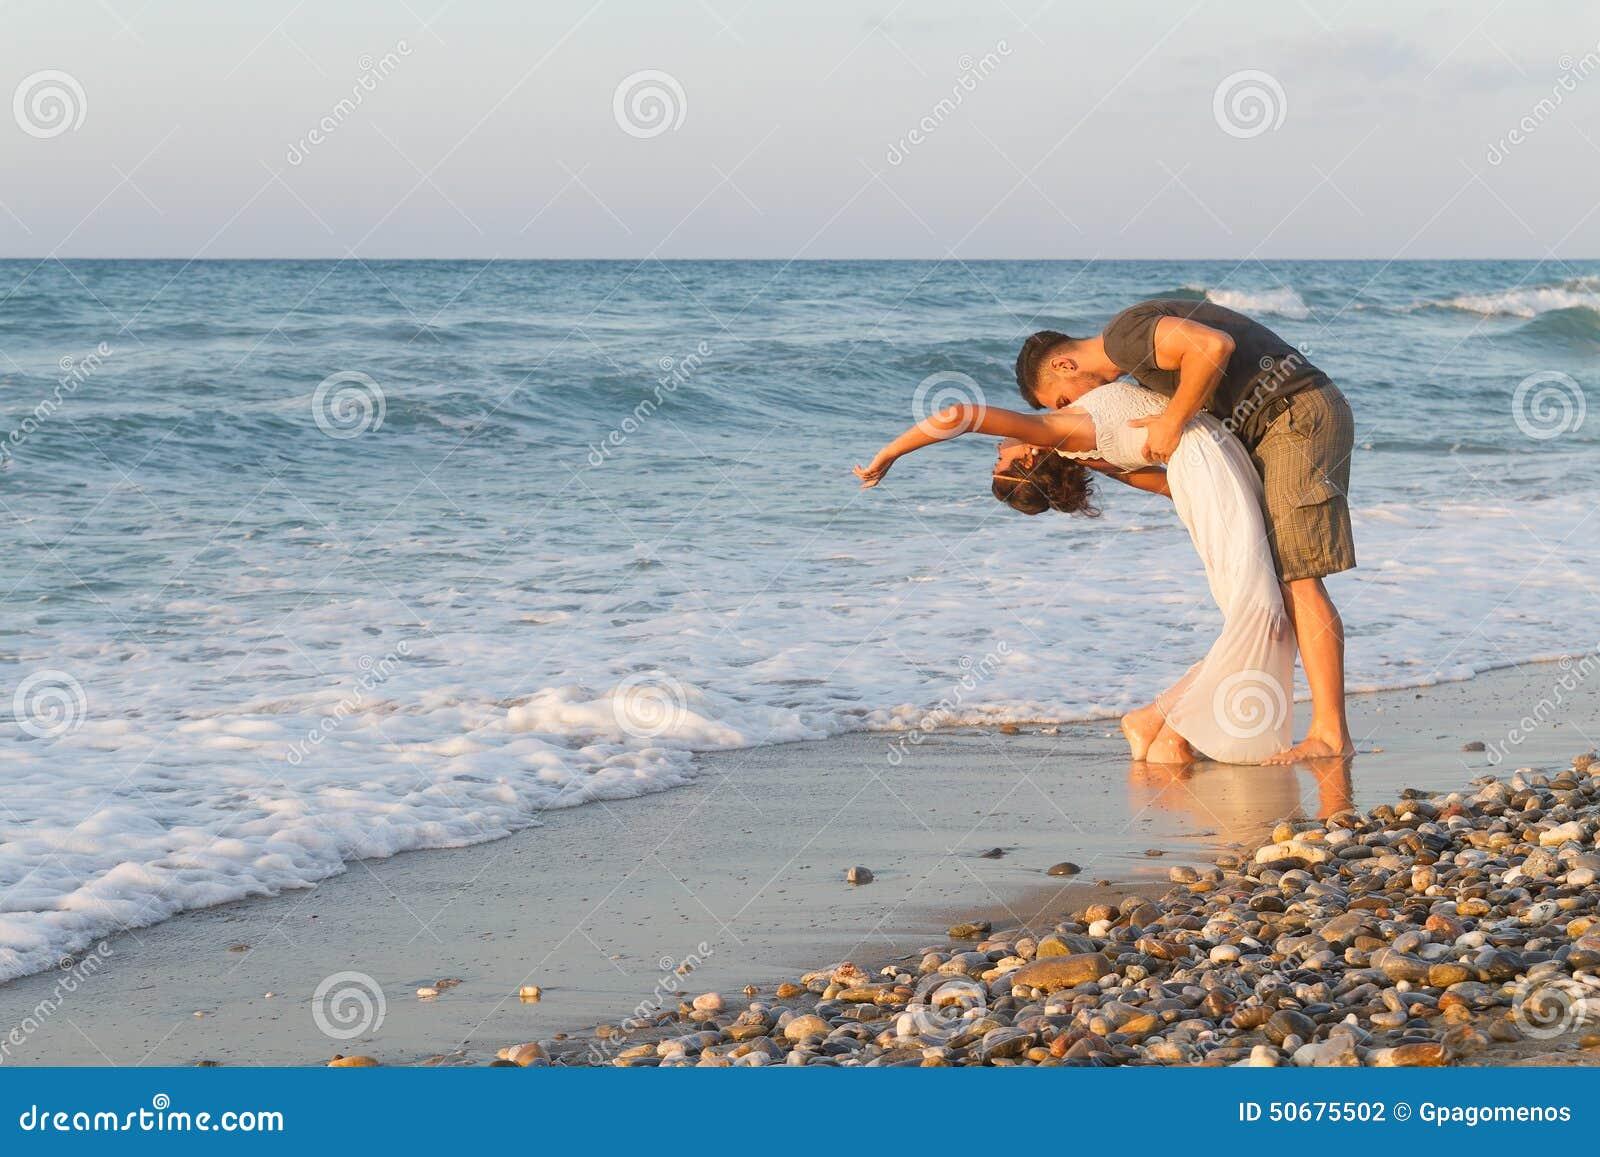 Download 年轻夫妇喜欢走在一个朦胧的海滩在 库存照片. 图片 包括有 幸福, 浪漫, 海运, 戏弄, 柔软, 日落 - 50675502